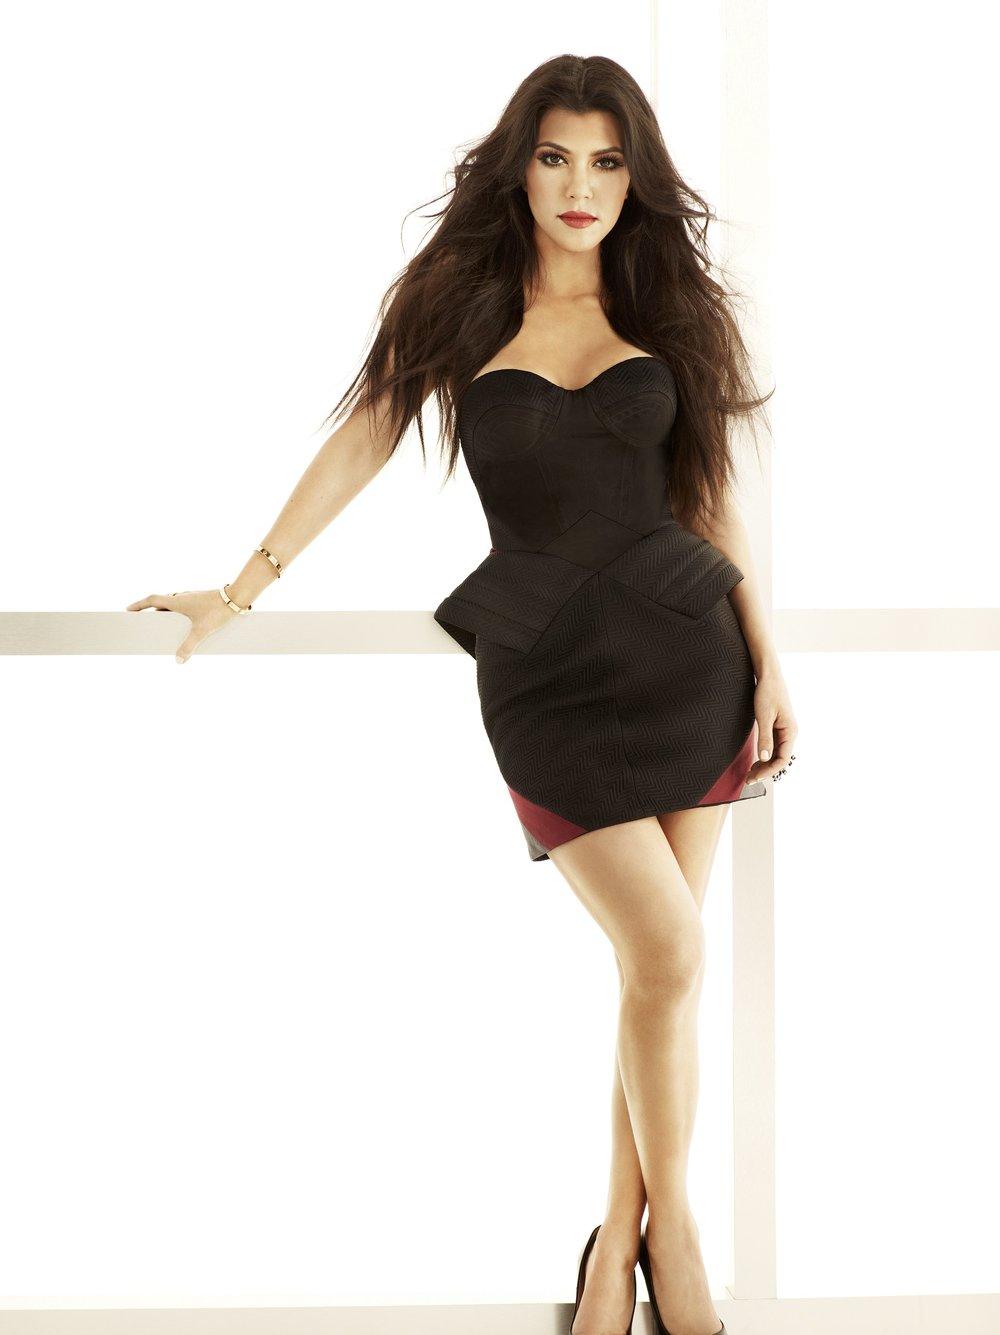 Kardashians S07 (8).jpg